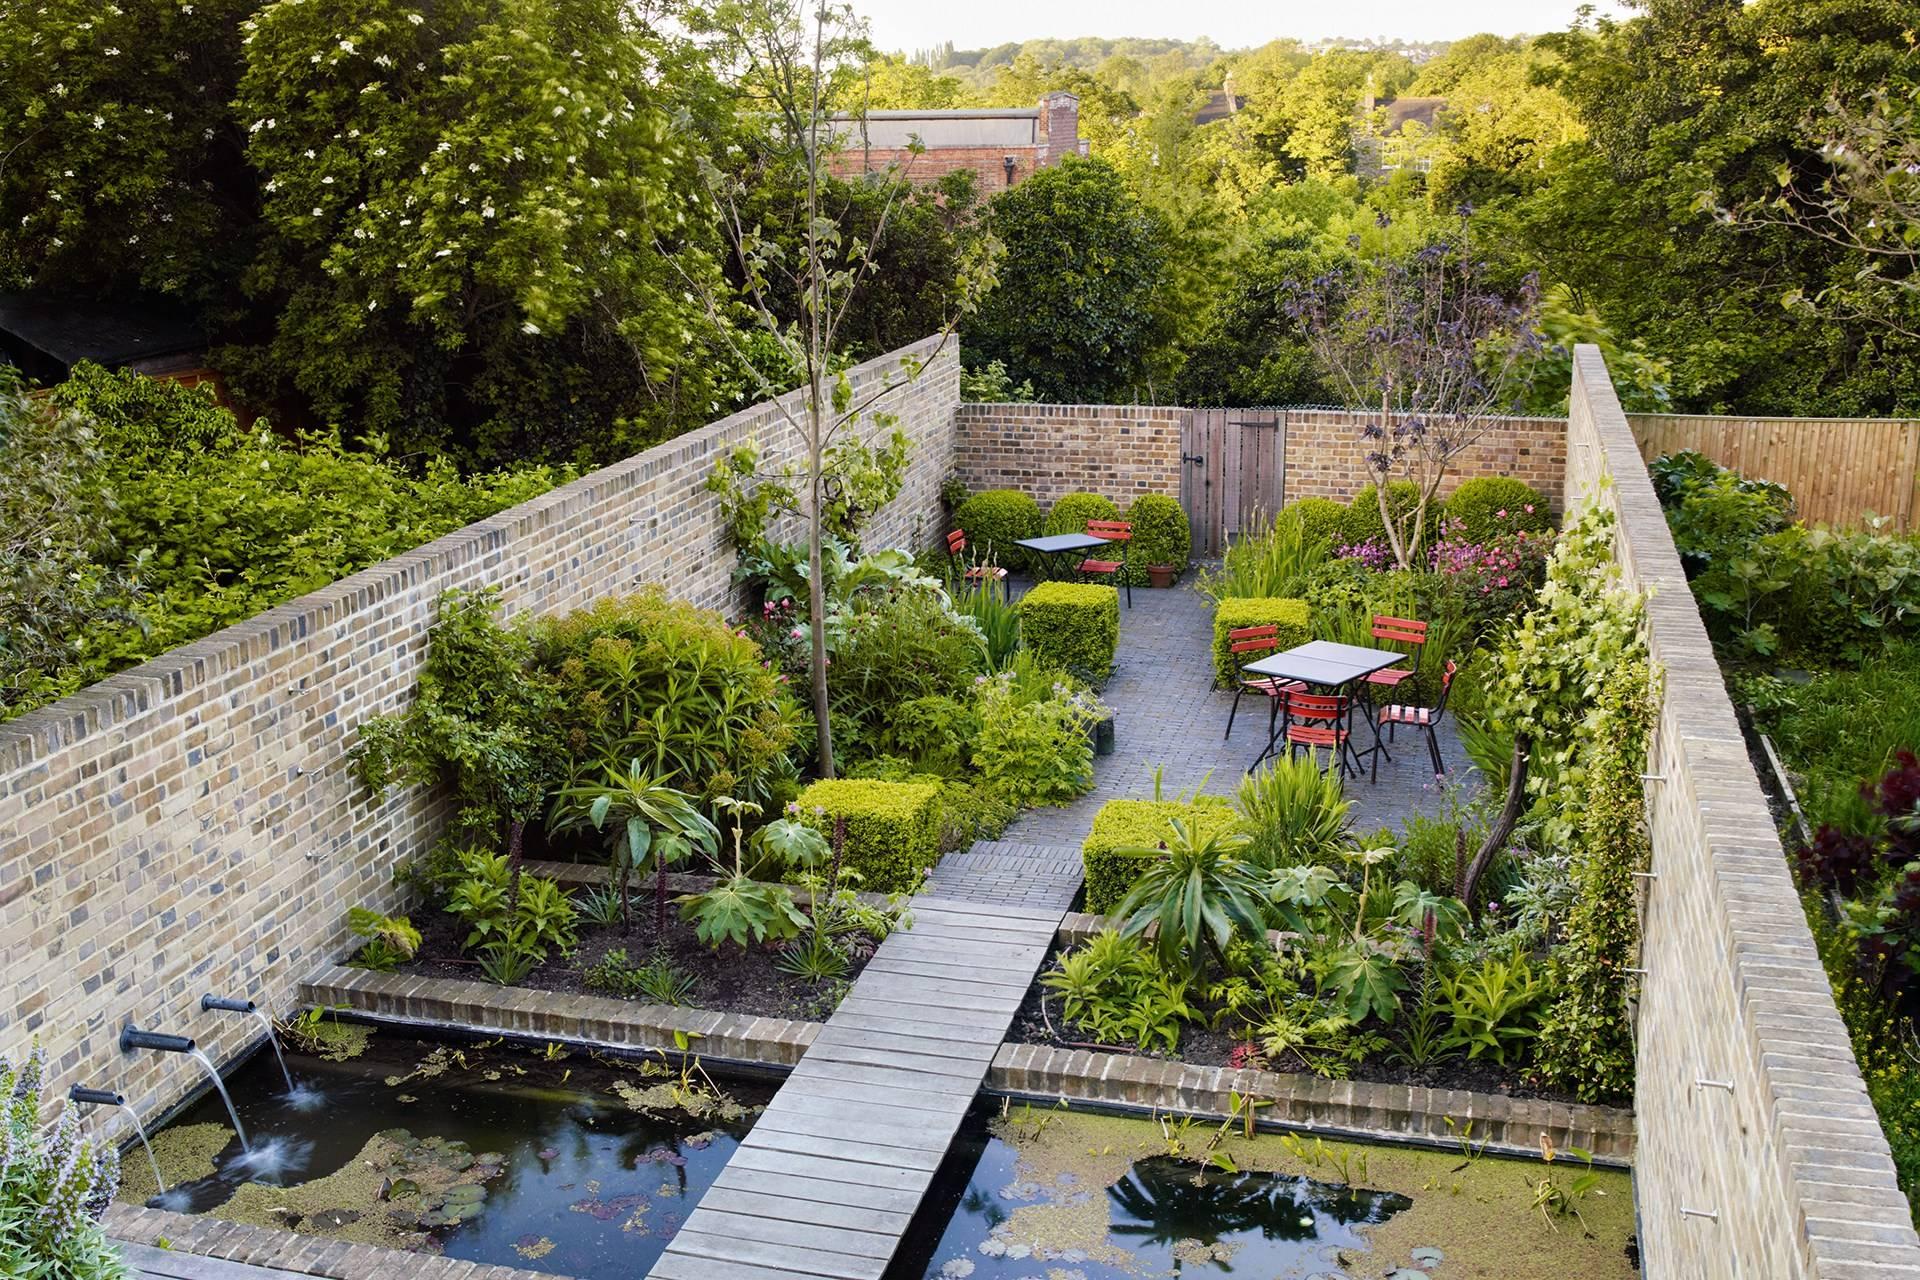 Garden Design The Basic Elements House Garden